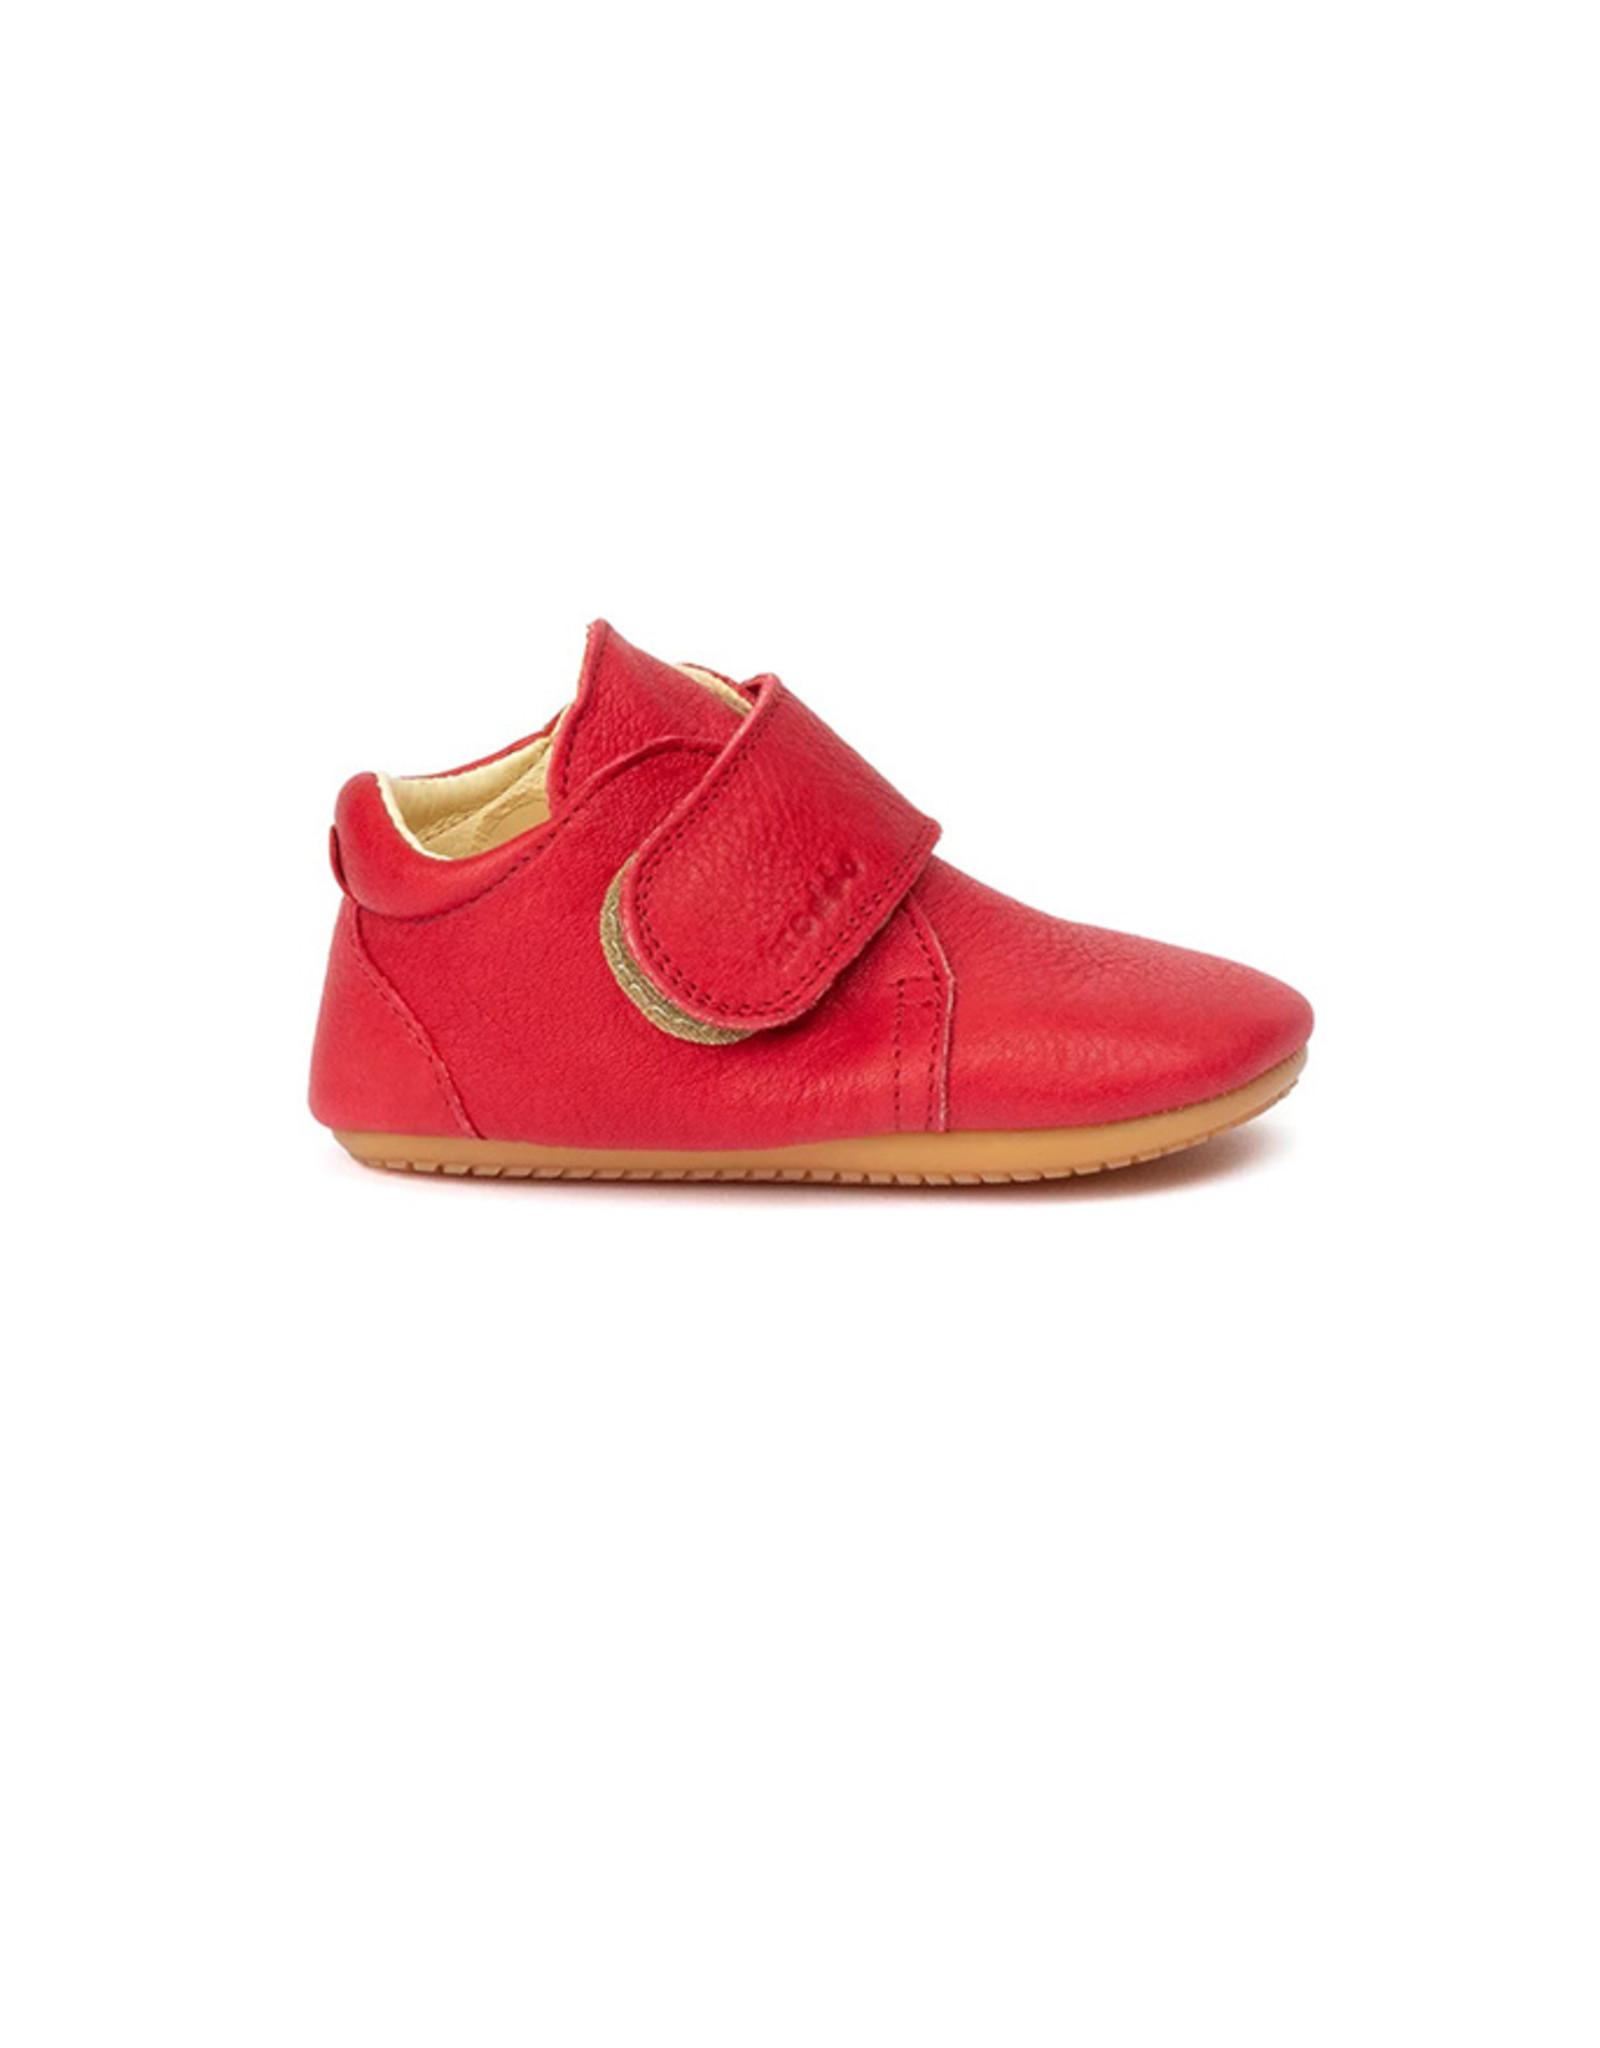 Froddo prewalker shoes red